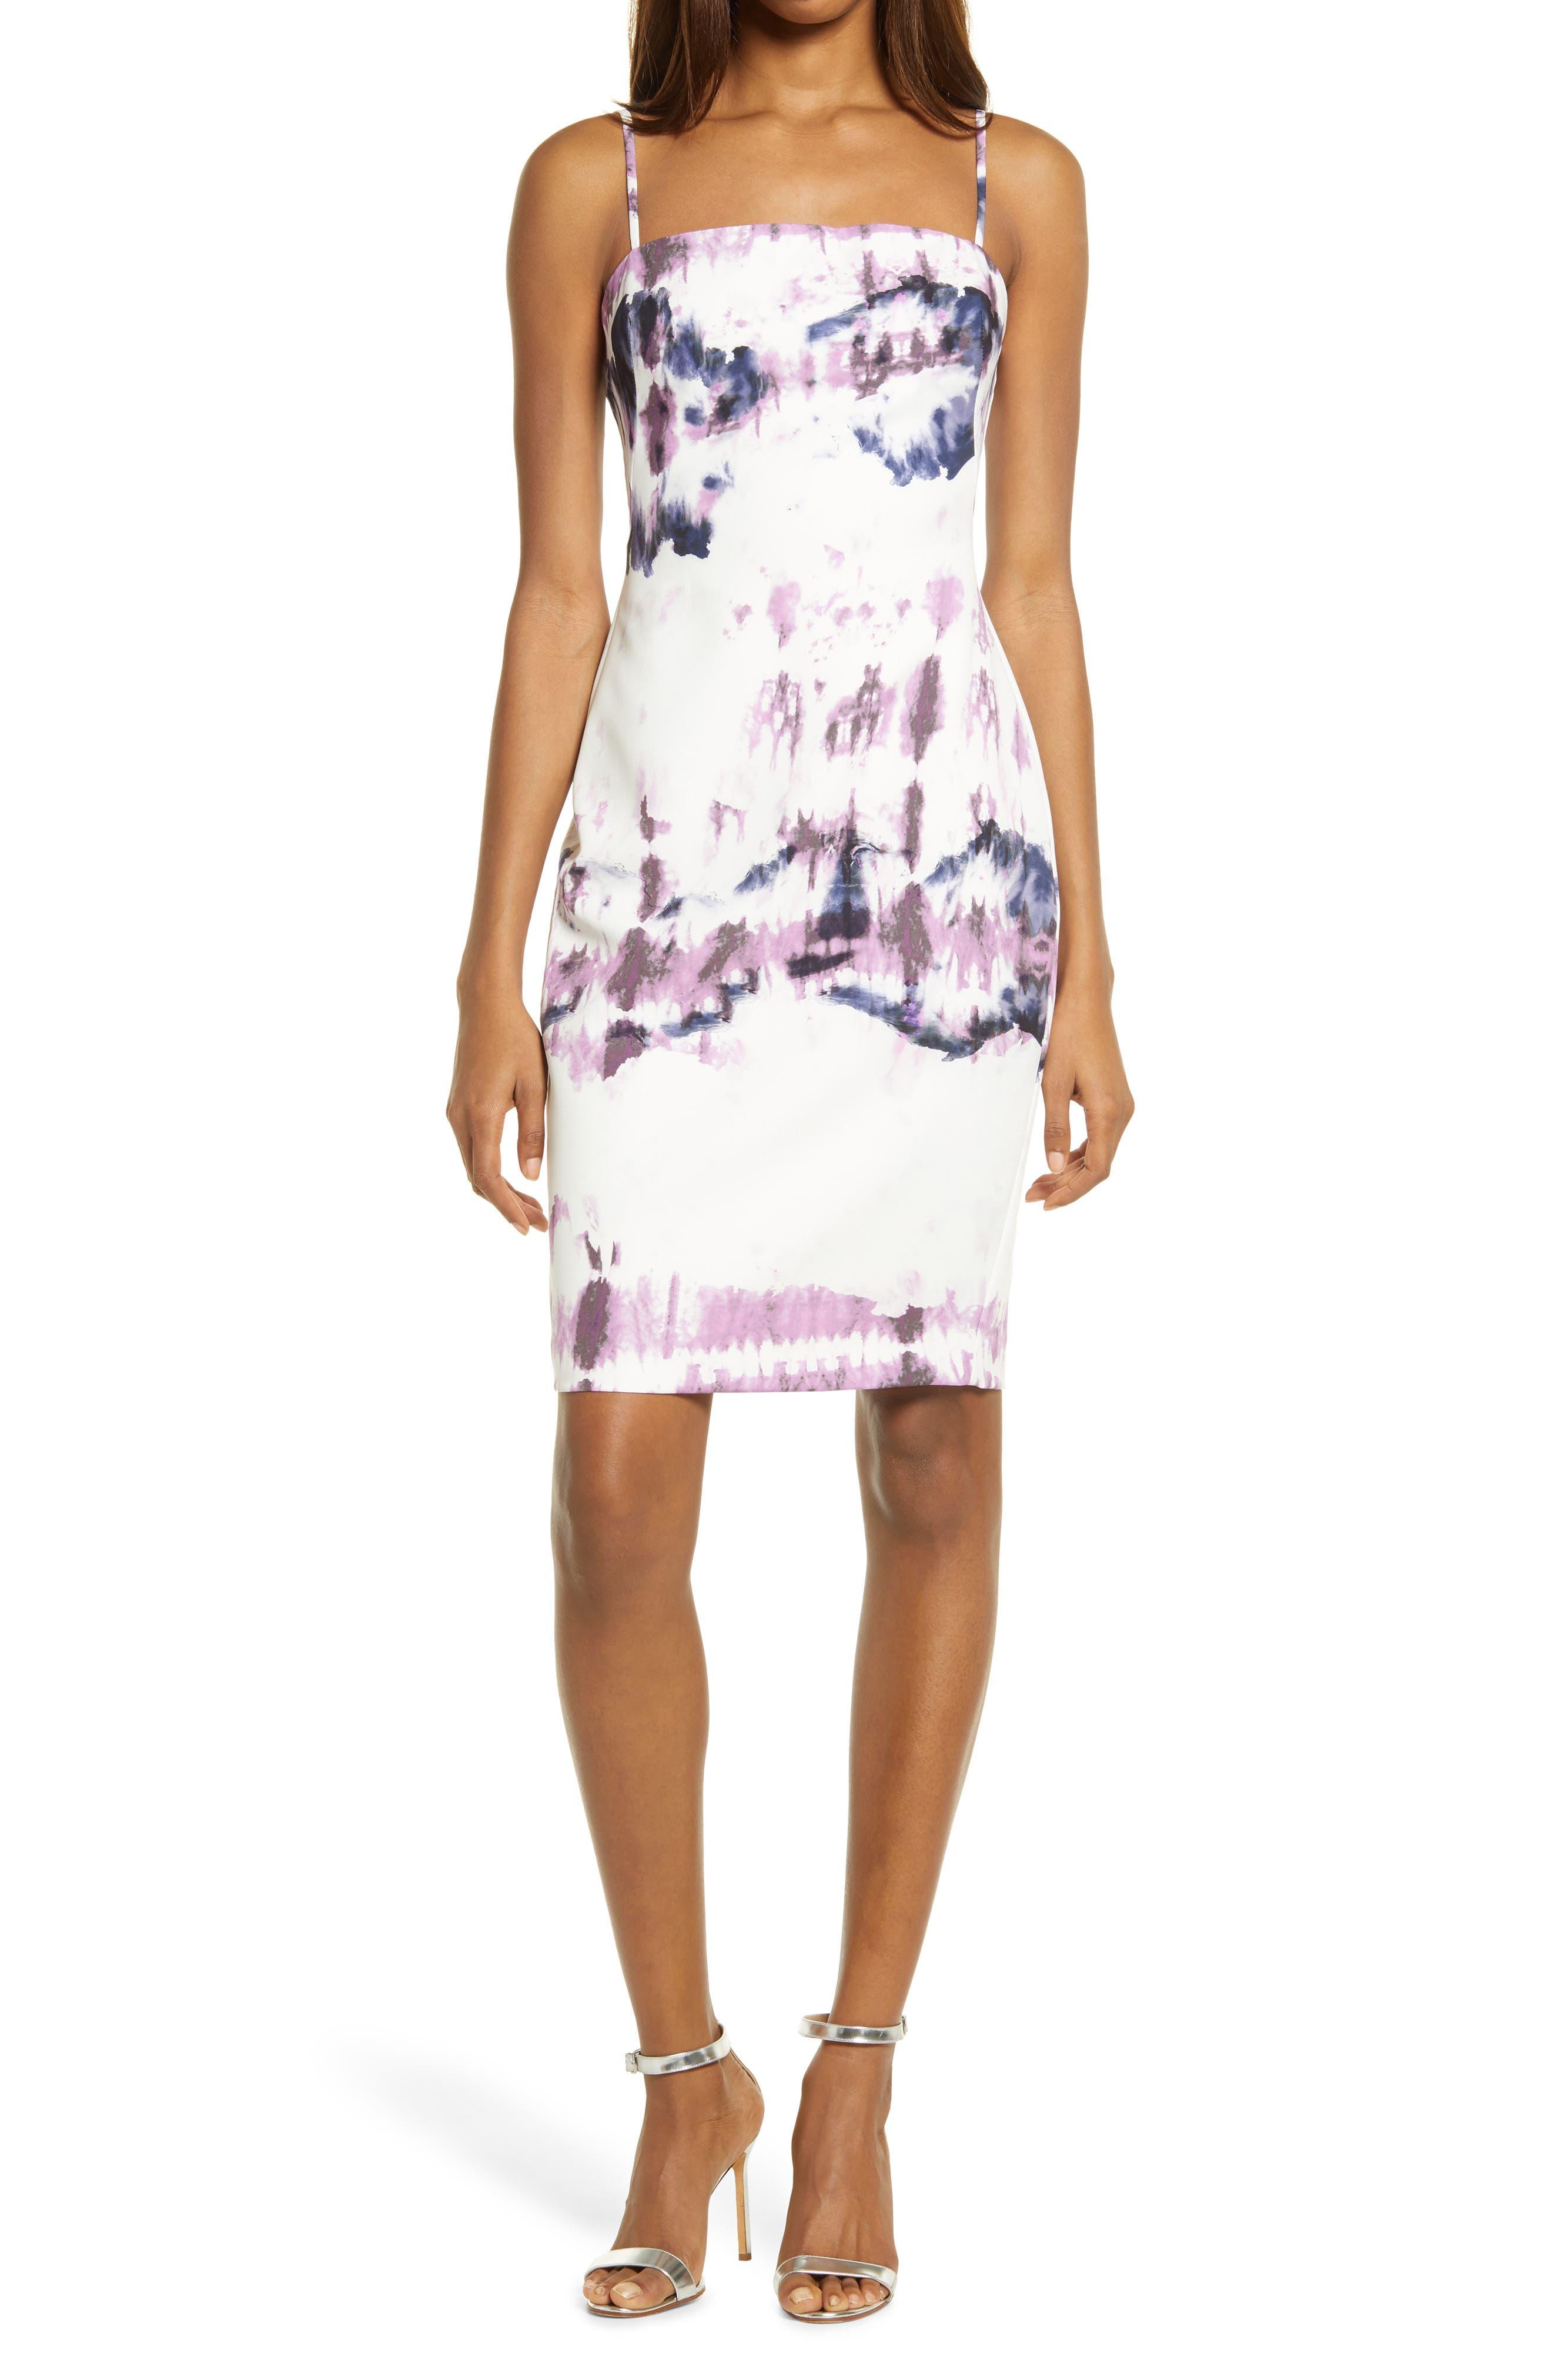 Capri Tie Dye Sheath Dress